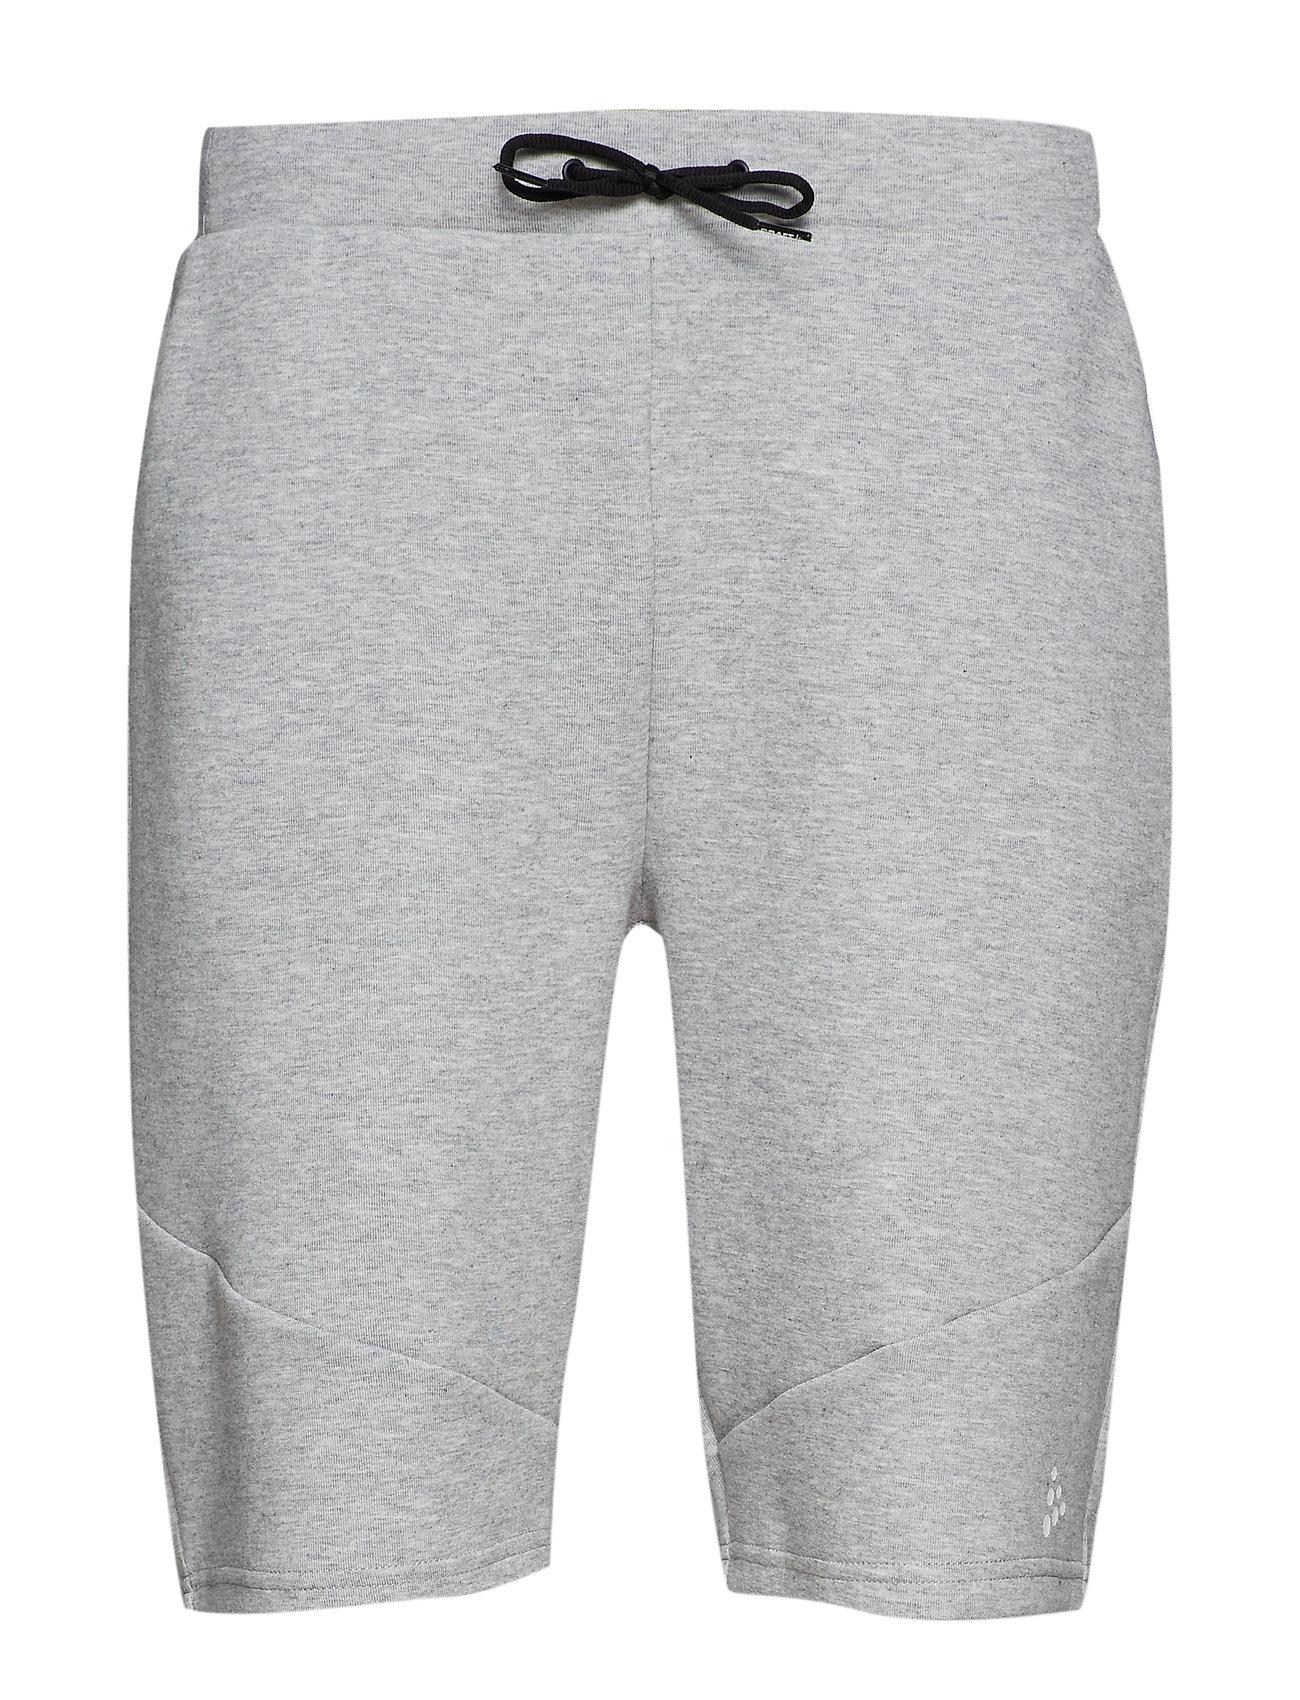 Craft District sweat shorts M - GREY MELANGE